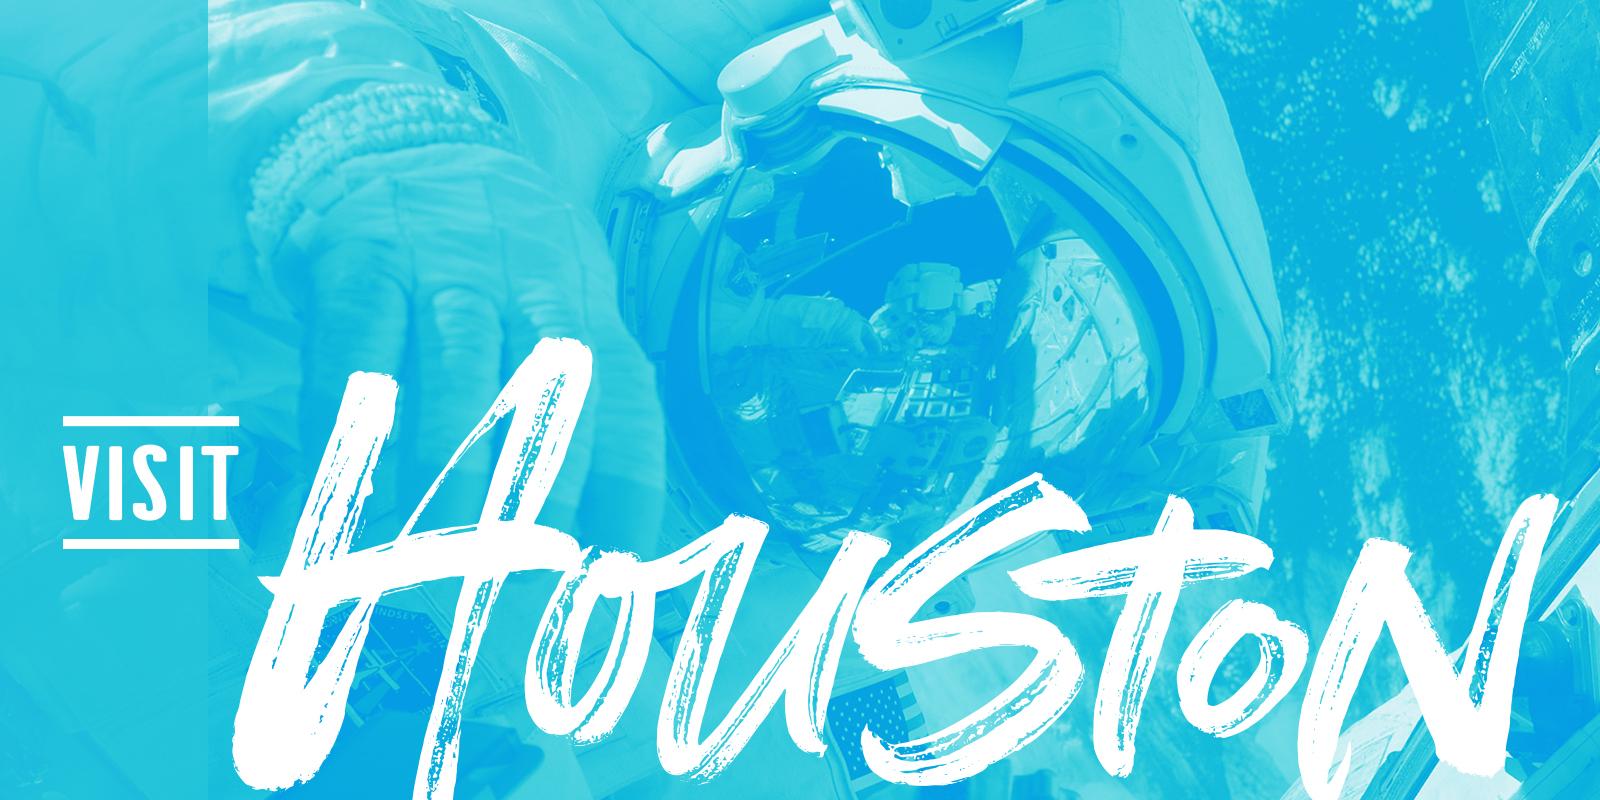 Visit Houston Brand Standards